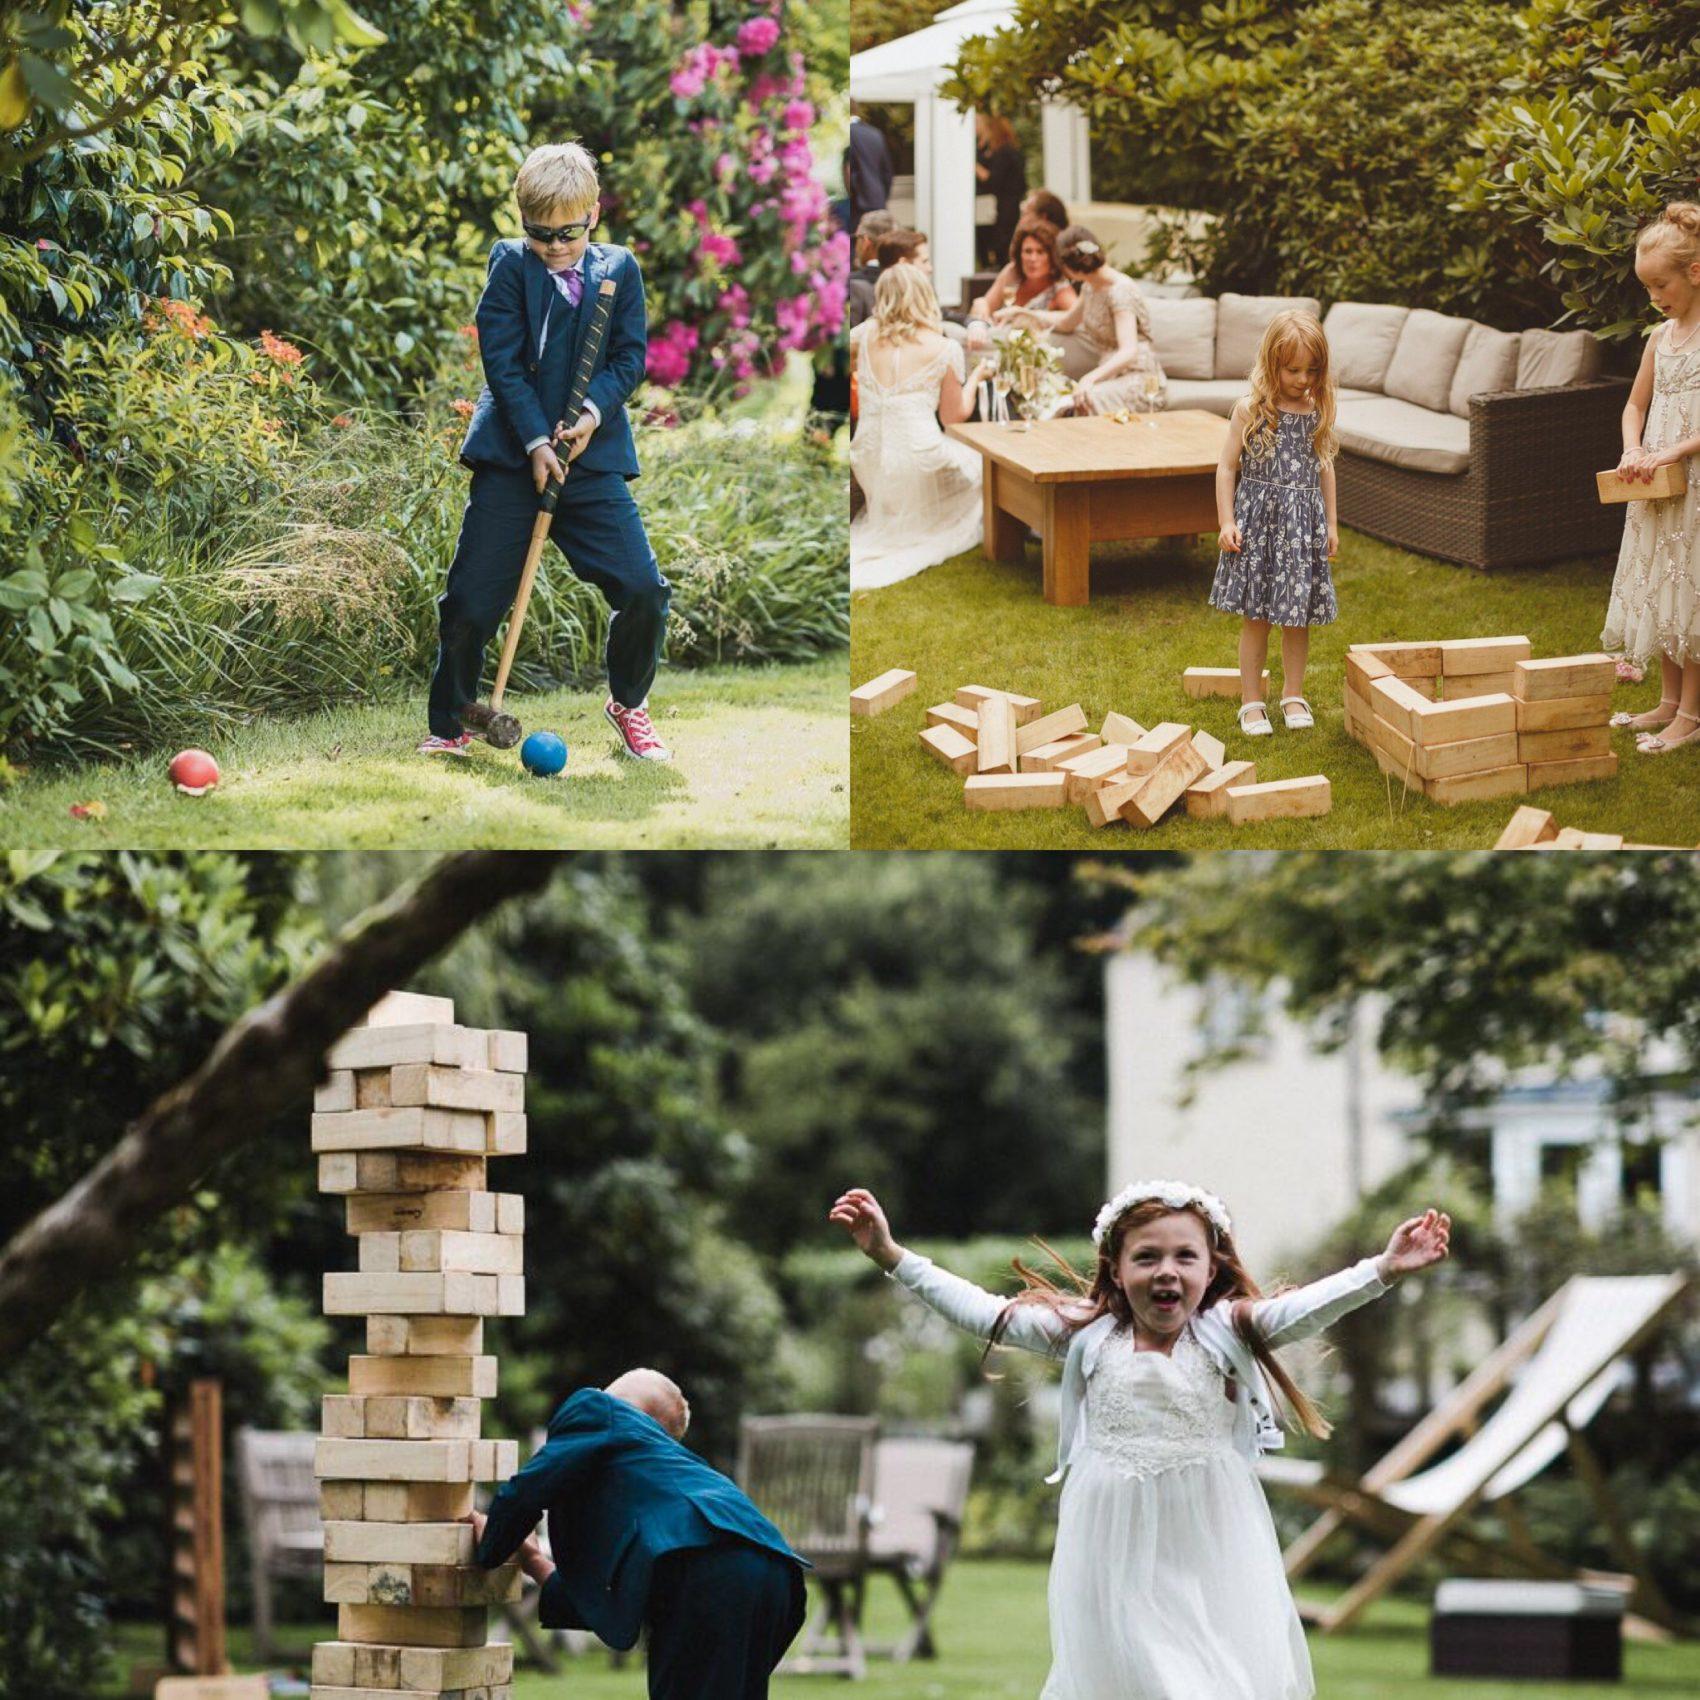 garden games, giant, jenga, garden, croquet, children, kids, wedding, ever after, 2019, entertainment, play, fun, occupied, party,